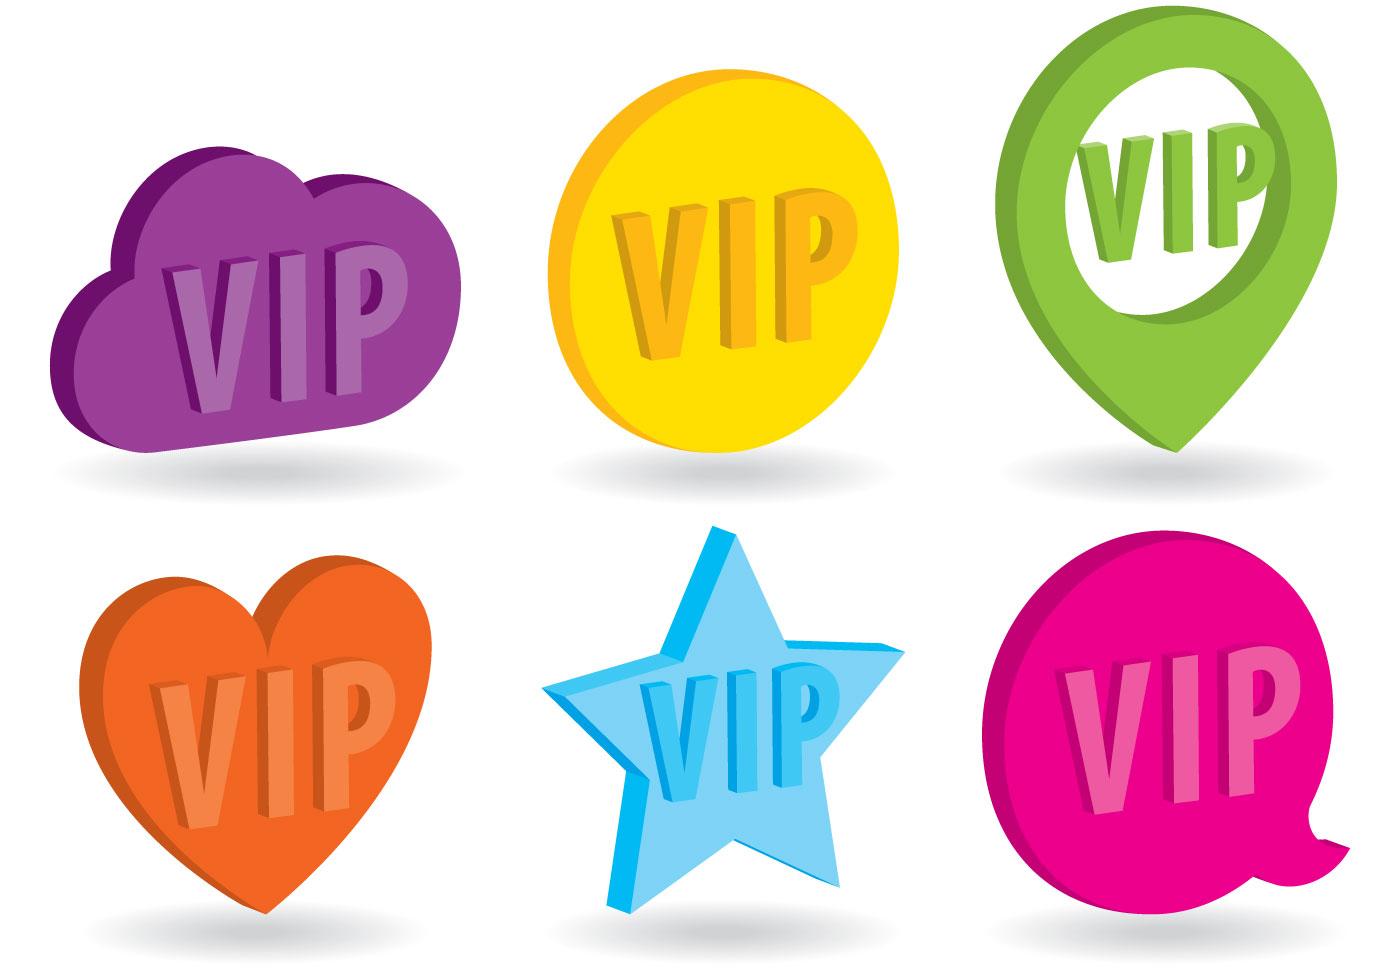 Isometric Vip Icon Vectors Download Free Vector Art